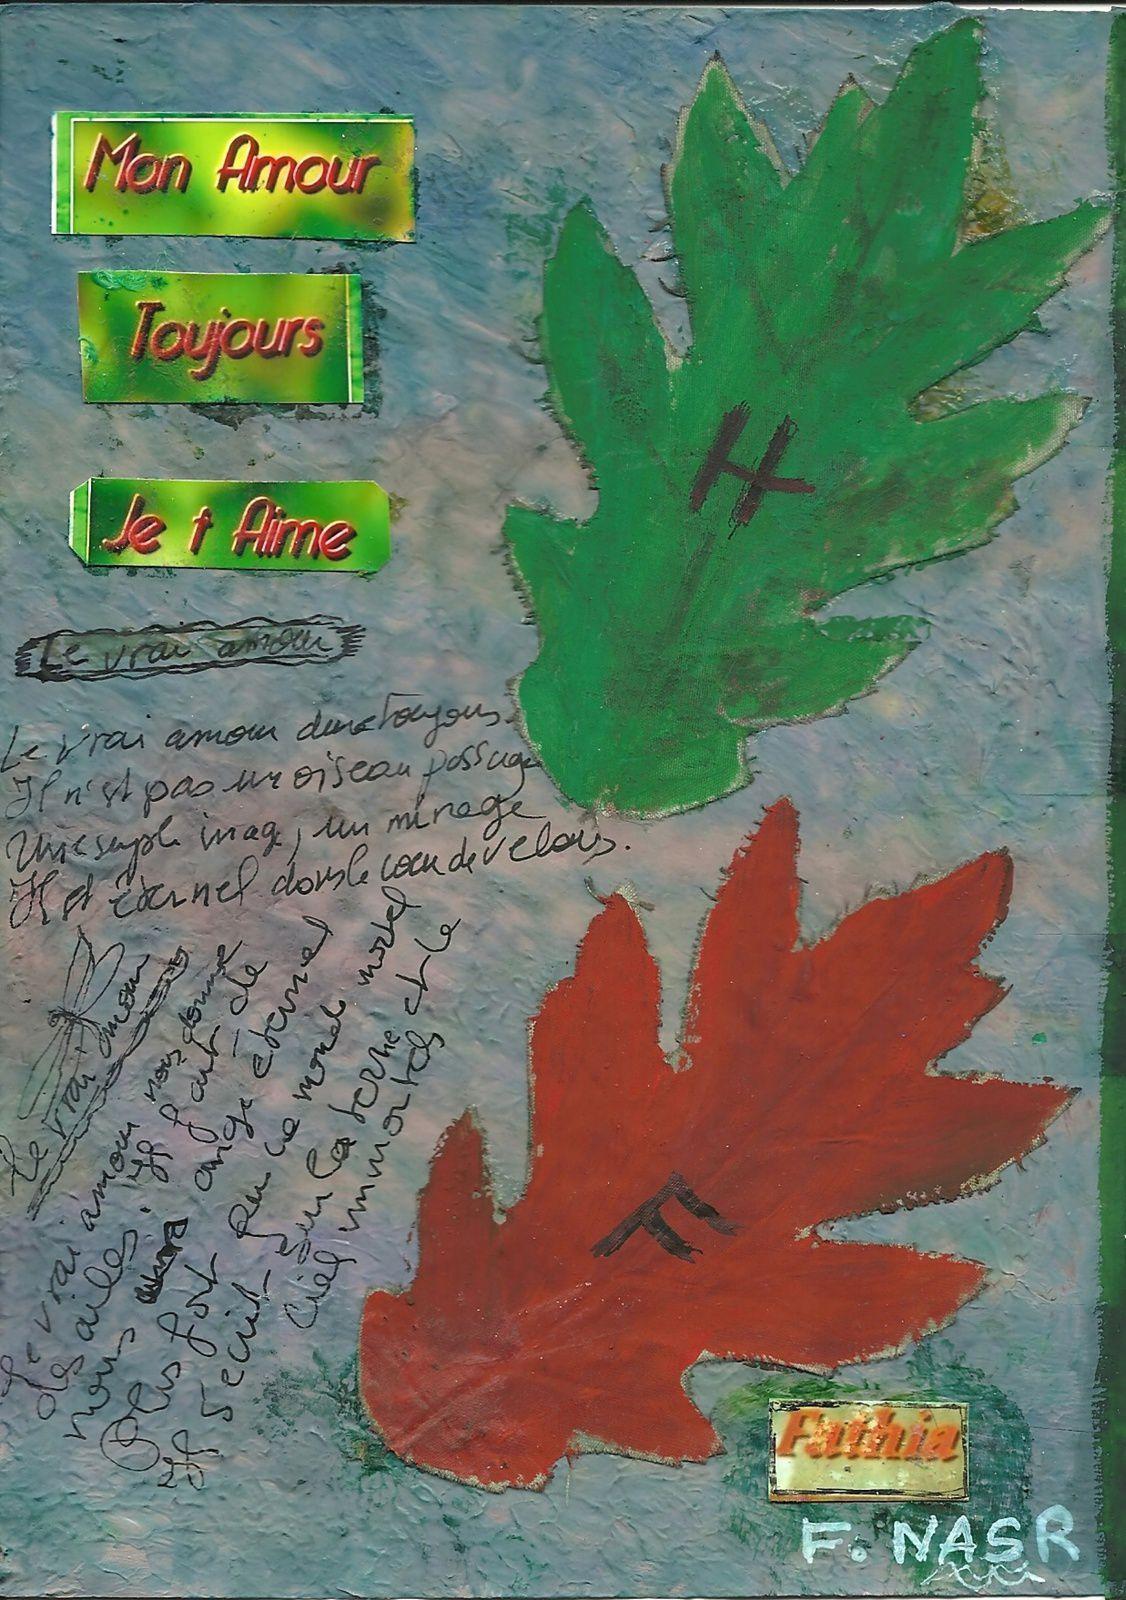 carterie,scrapbooking,carte,faite,main,amour,valentin,cœur,oiseaux,cage,fleurs,toi,moi,love,card,valentine,day,heart,perles,you,me,fathia,nasr,aime,